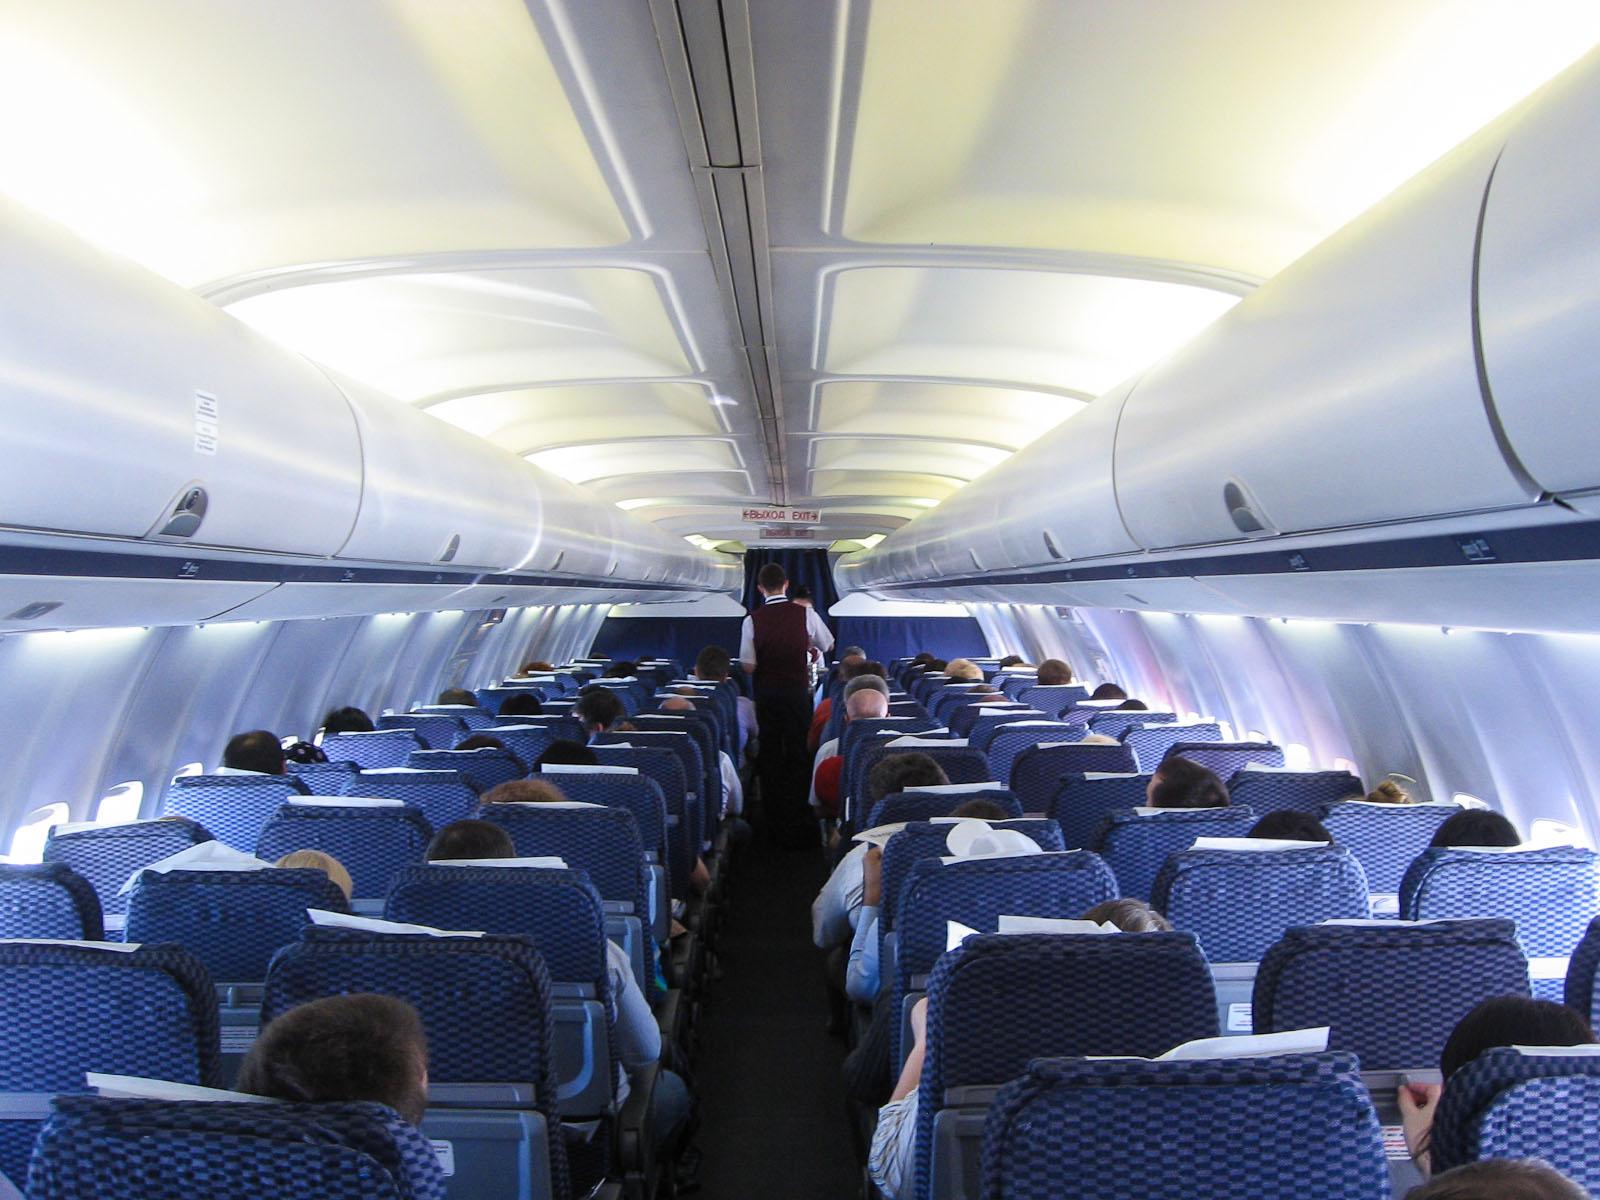 фото боинг 737-500 ютэйр